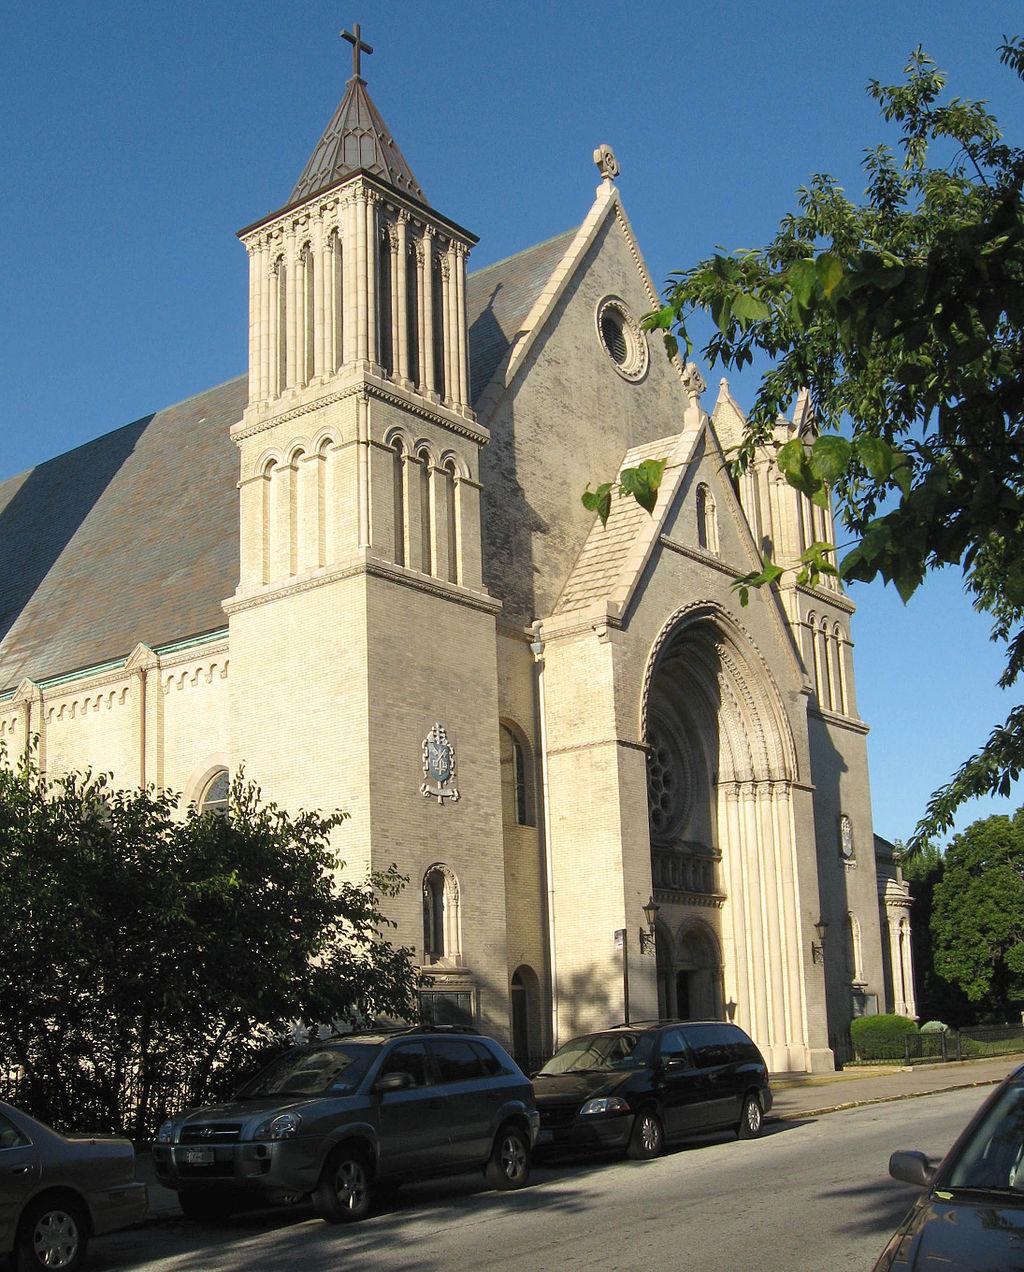 St peters church  photo